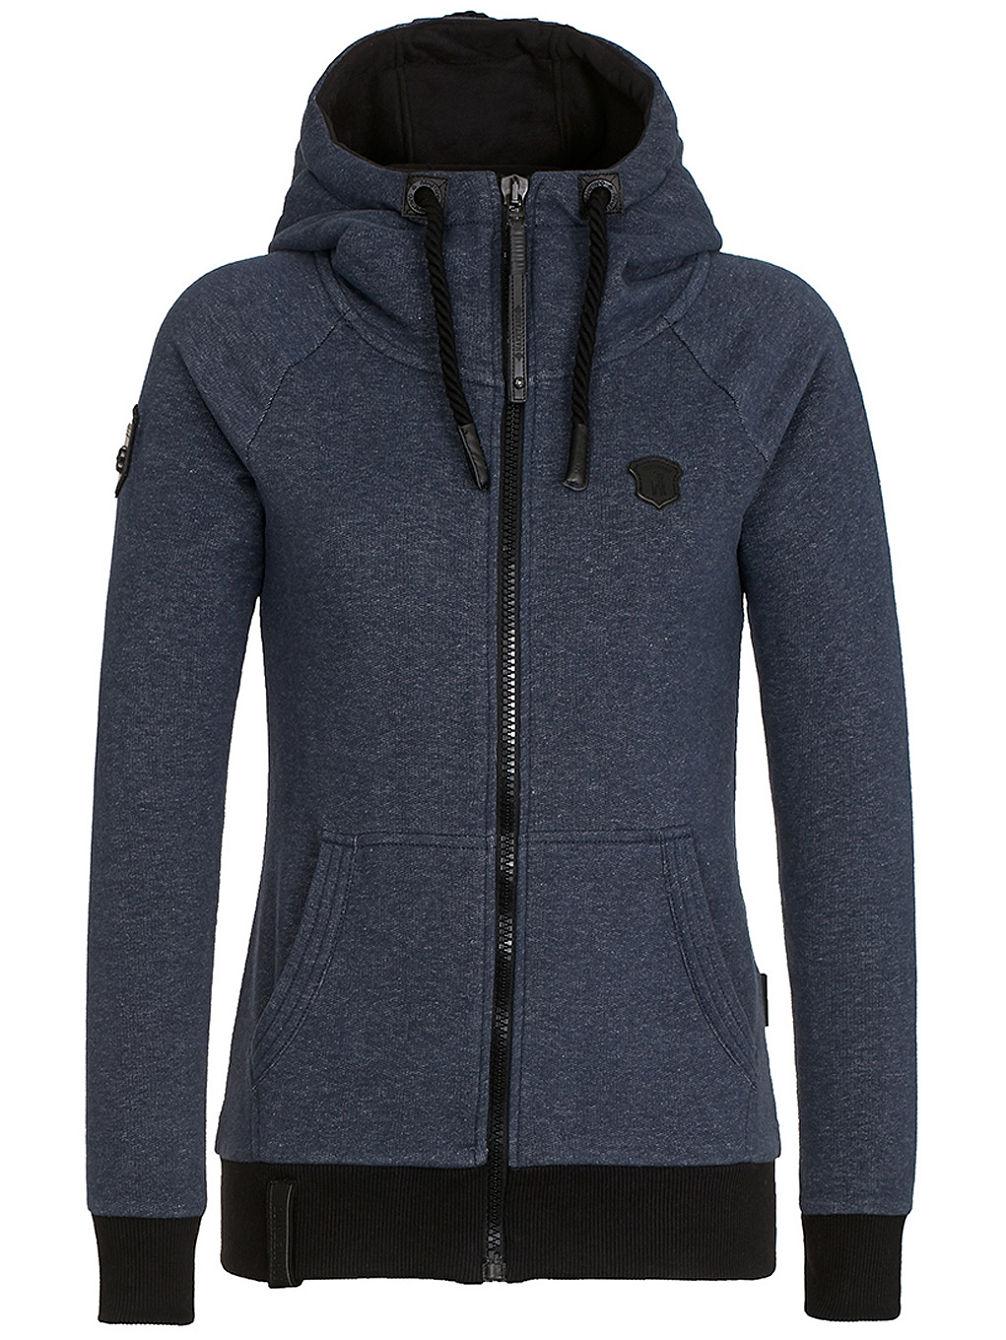 buy naketano warrior princess ii zip hoodie online at blue. Black Bedroom Furniture Sets. Home Design Ideas